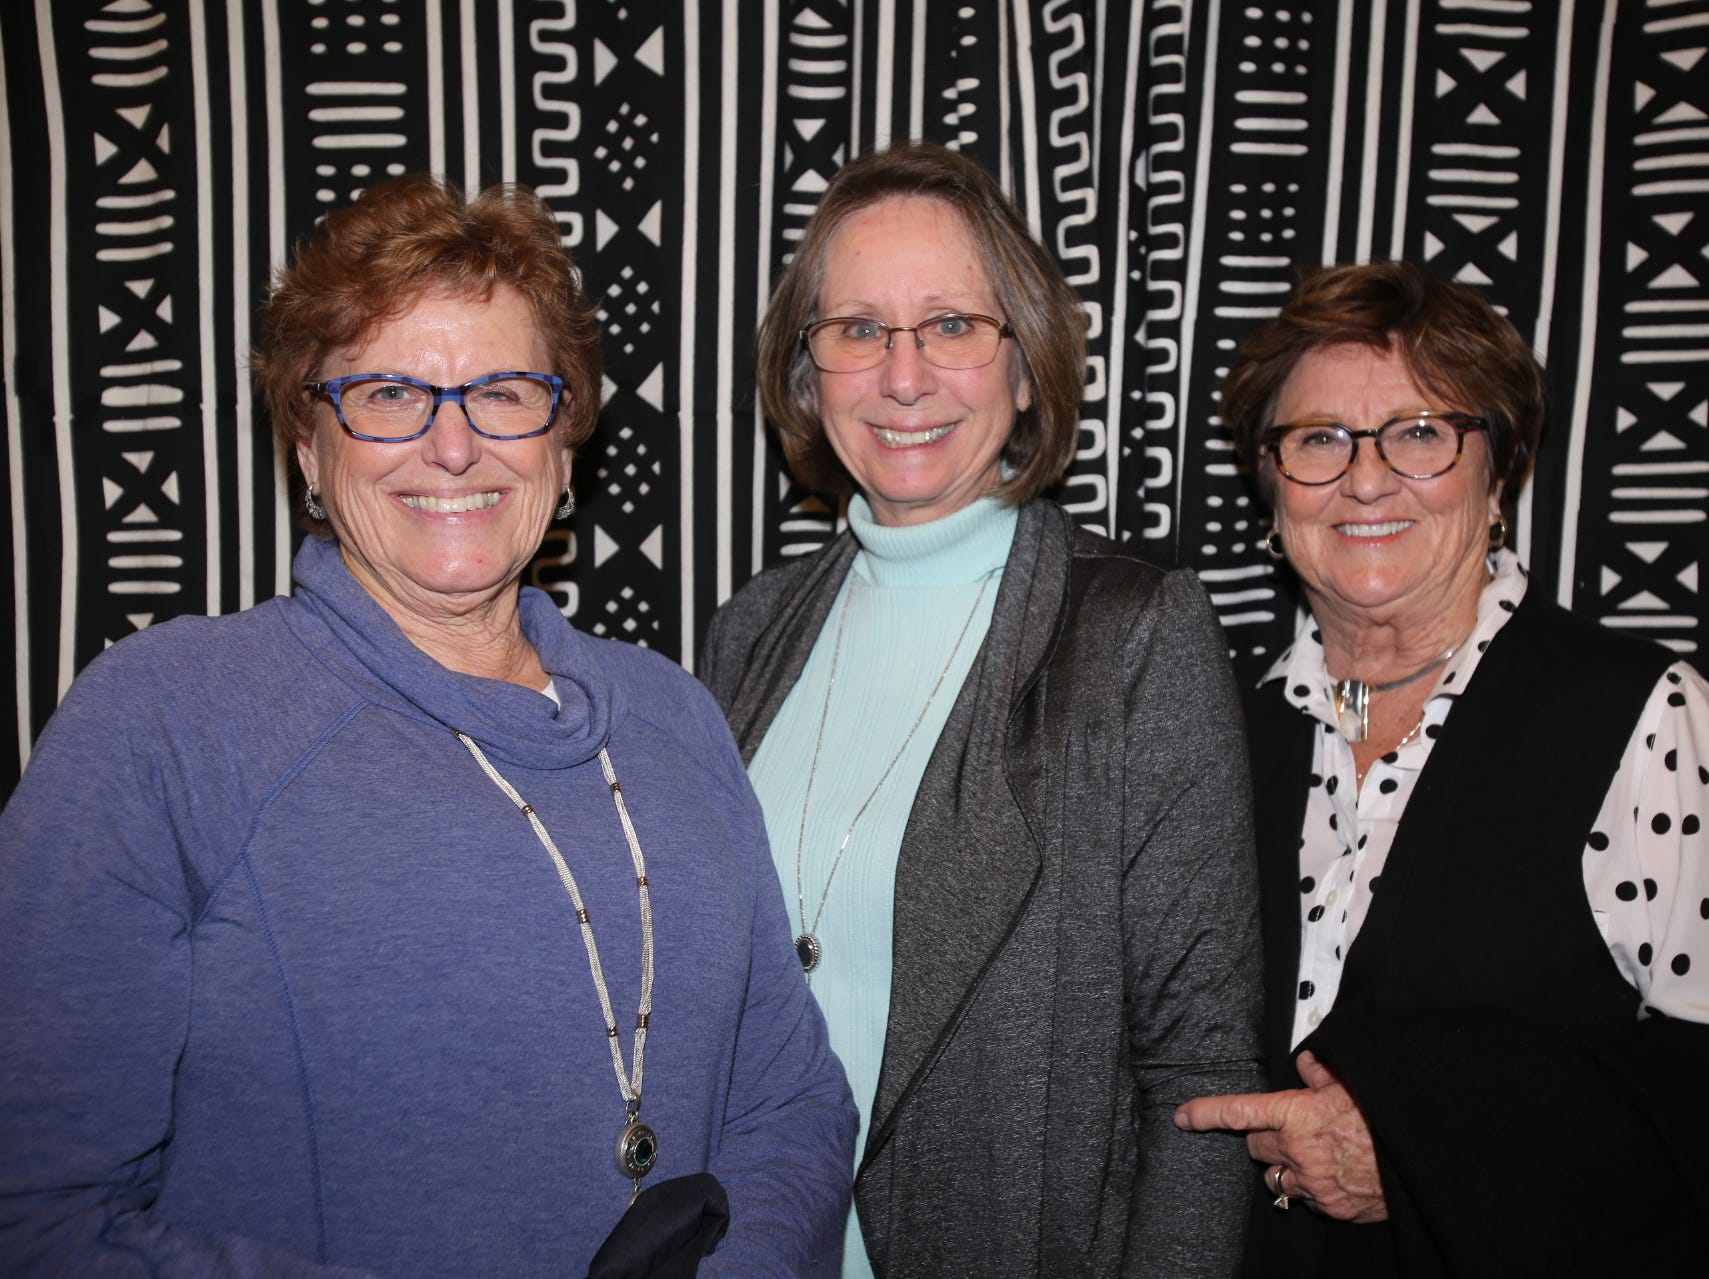 Donna Patterson, Ann Caraway, and Carol Stidham